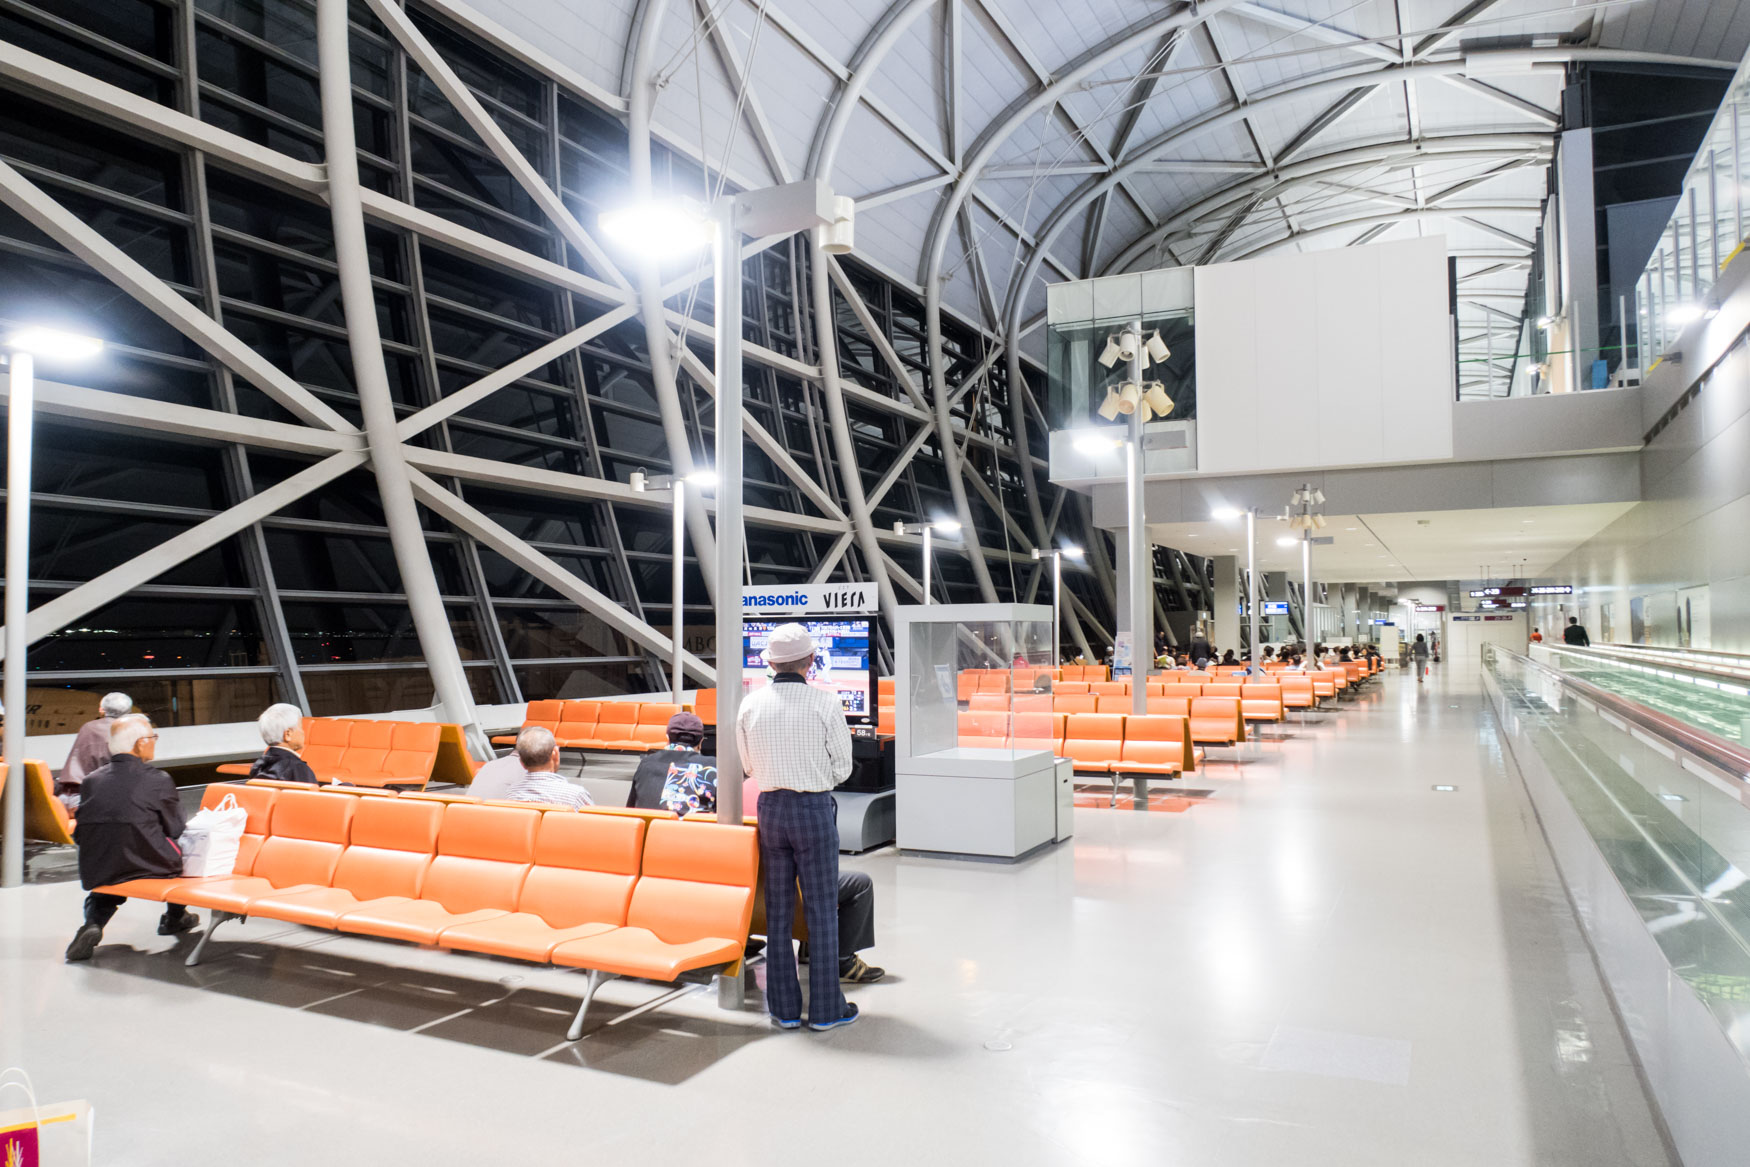 Kansai Airport Domestic Area